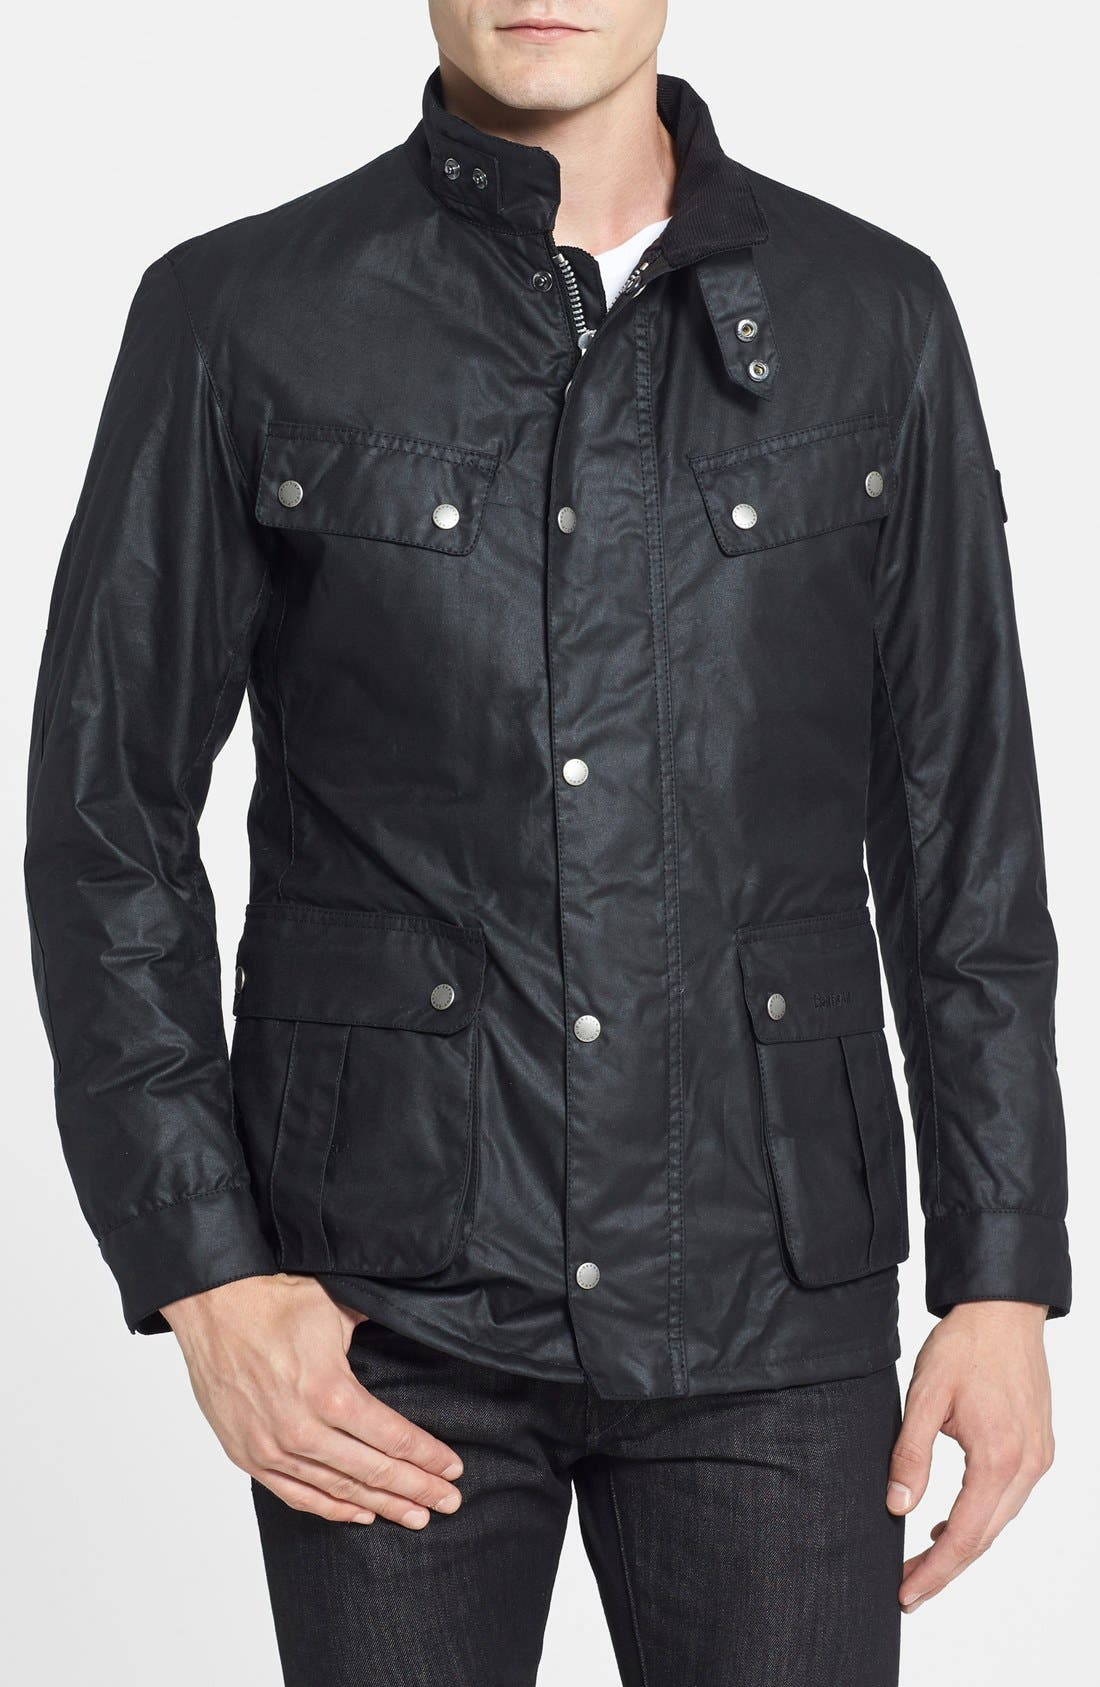 Main Image - Barbour 'Duke' Regular Fit Waterproof Waxed Cotton Jacket